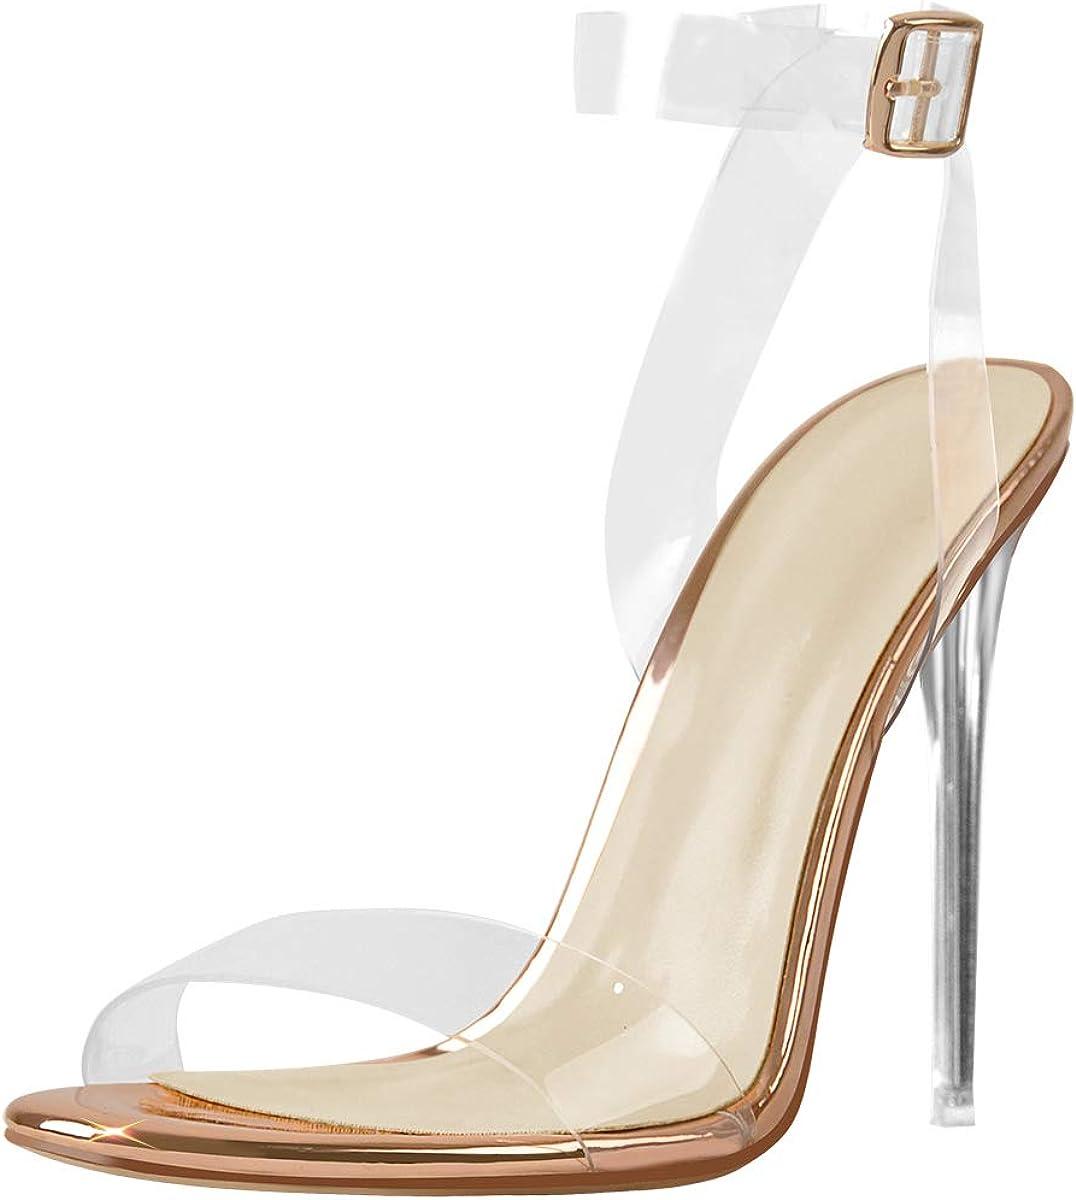 Richealnana Women's Clear PVC High Heels Ankle Buckle Heeled Sandals